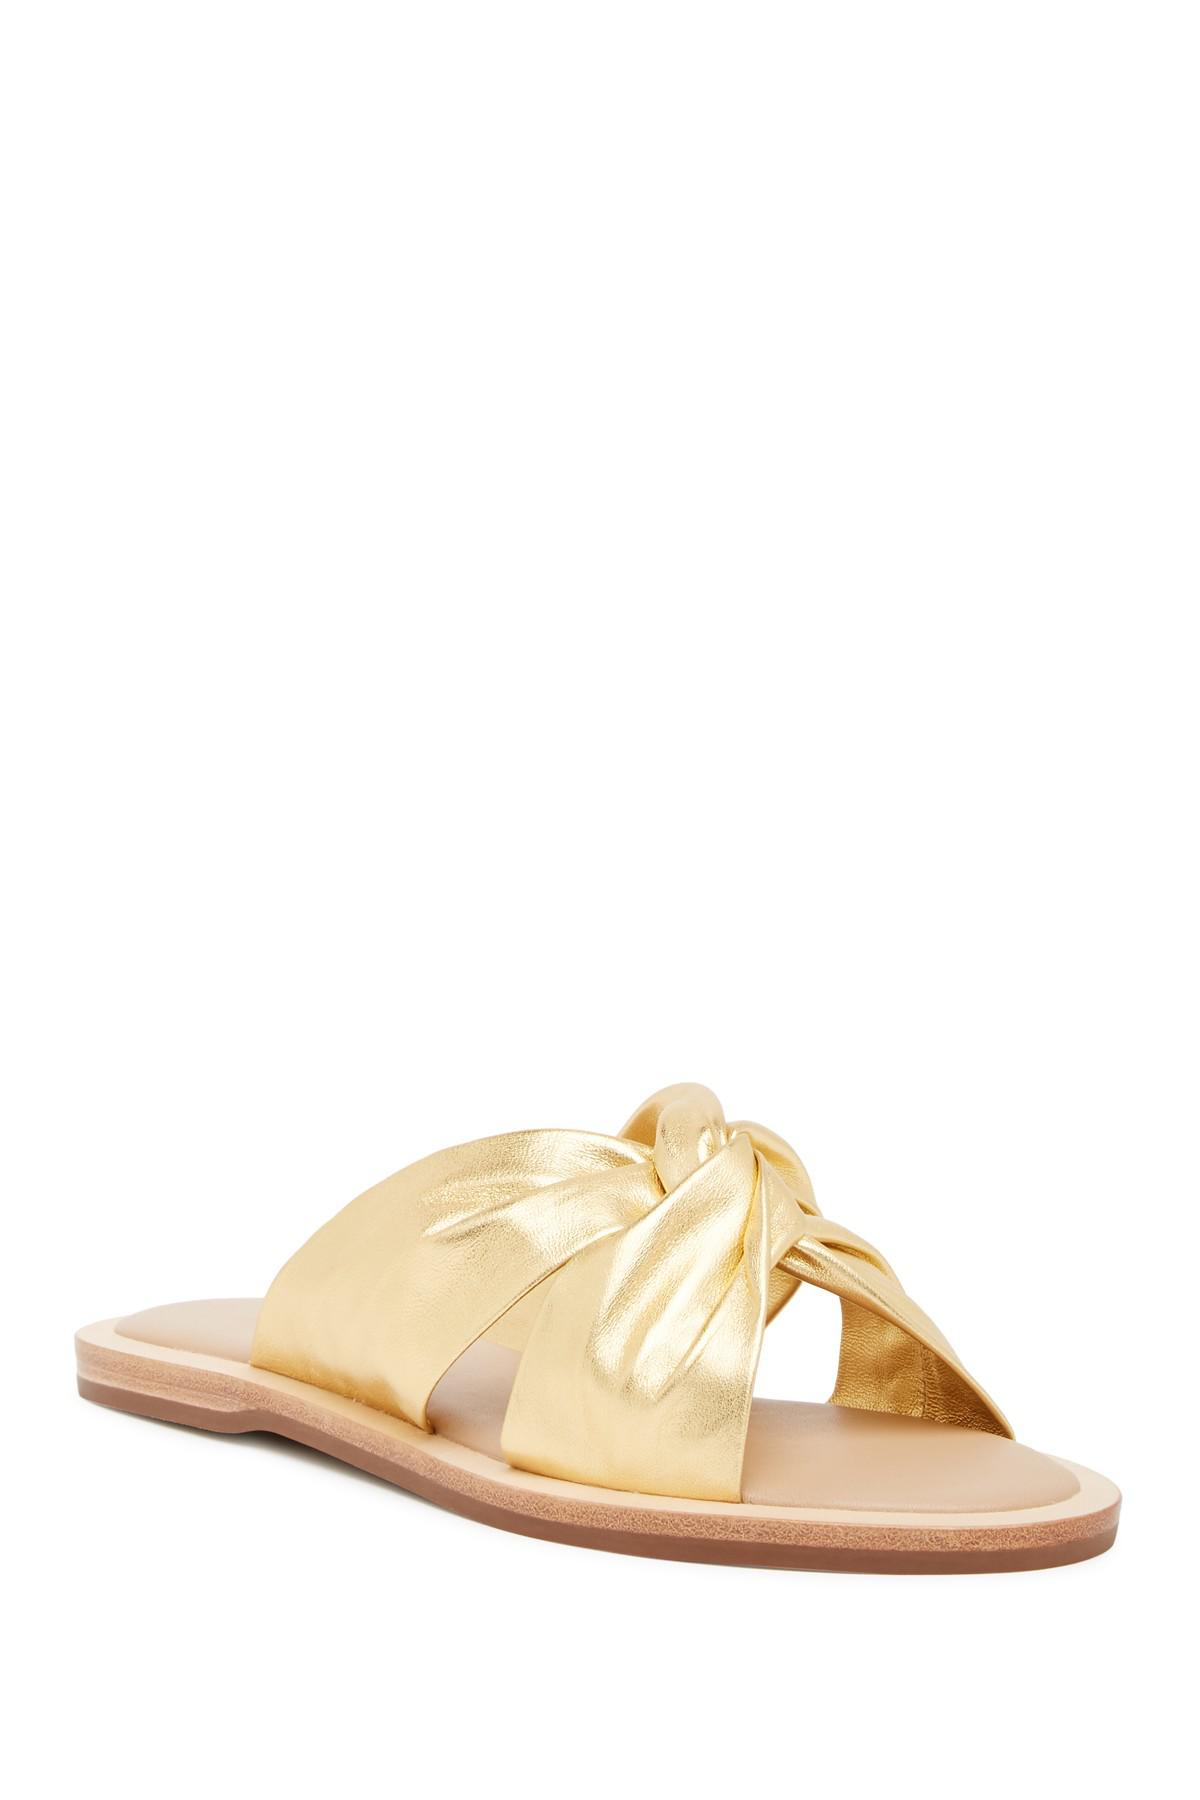 Rachel Zoe Hampton Leather Flat Sandal m0ocOX0t0Q